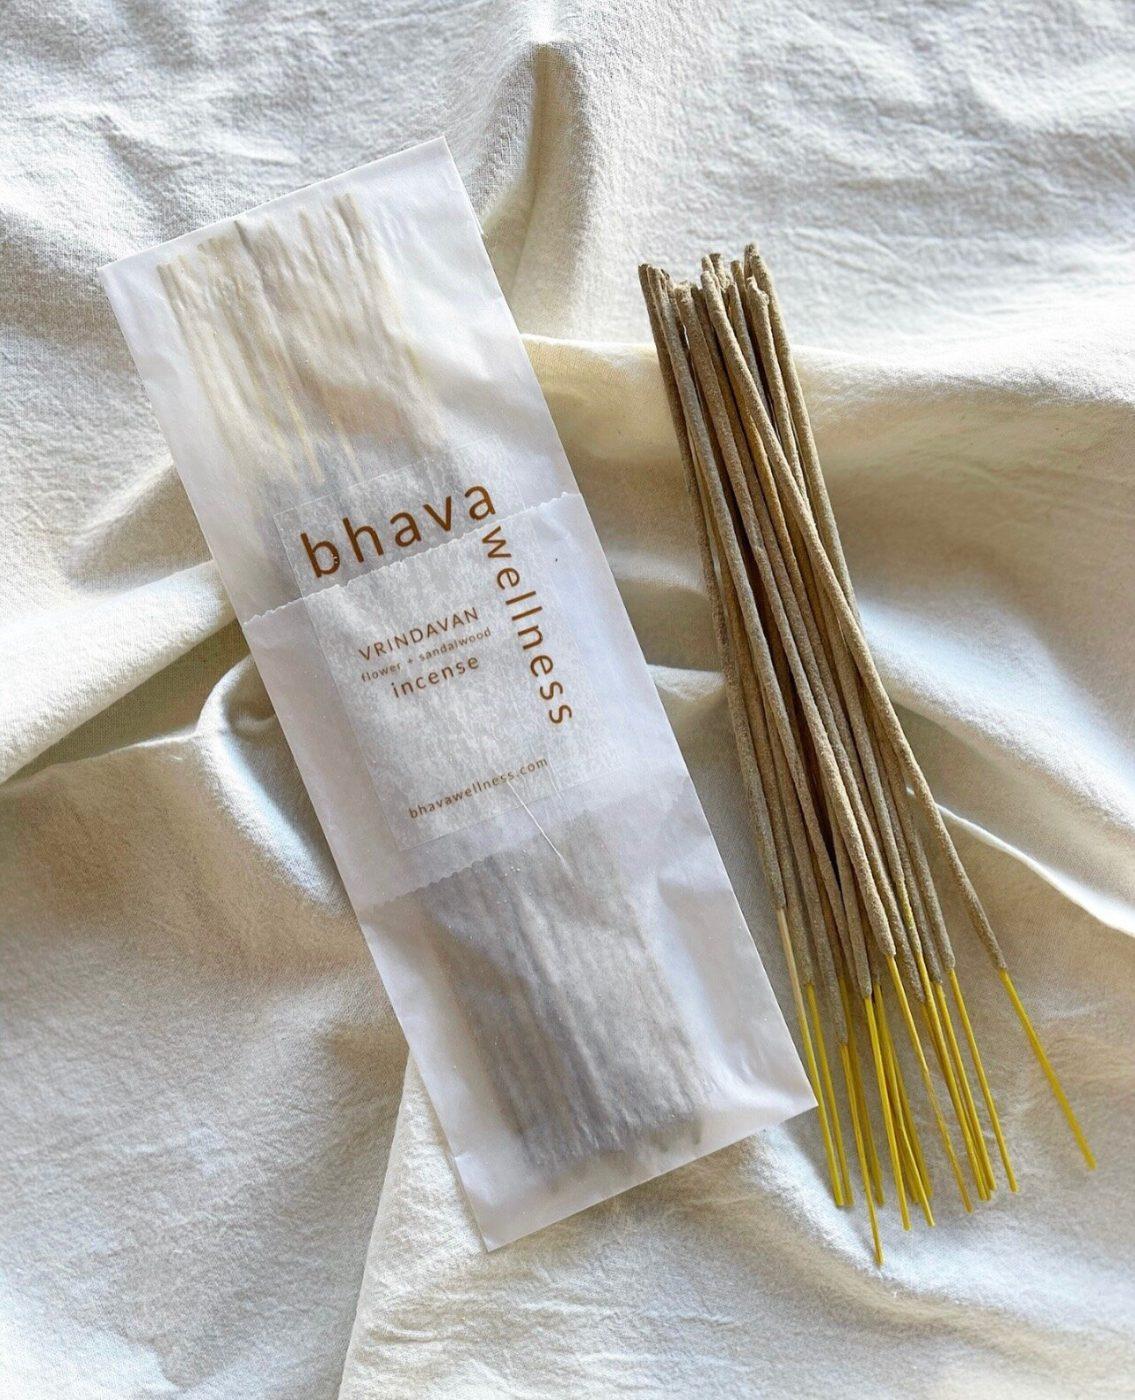 vrindavan sandalwood incense